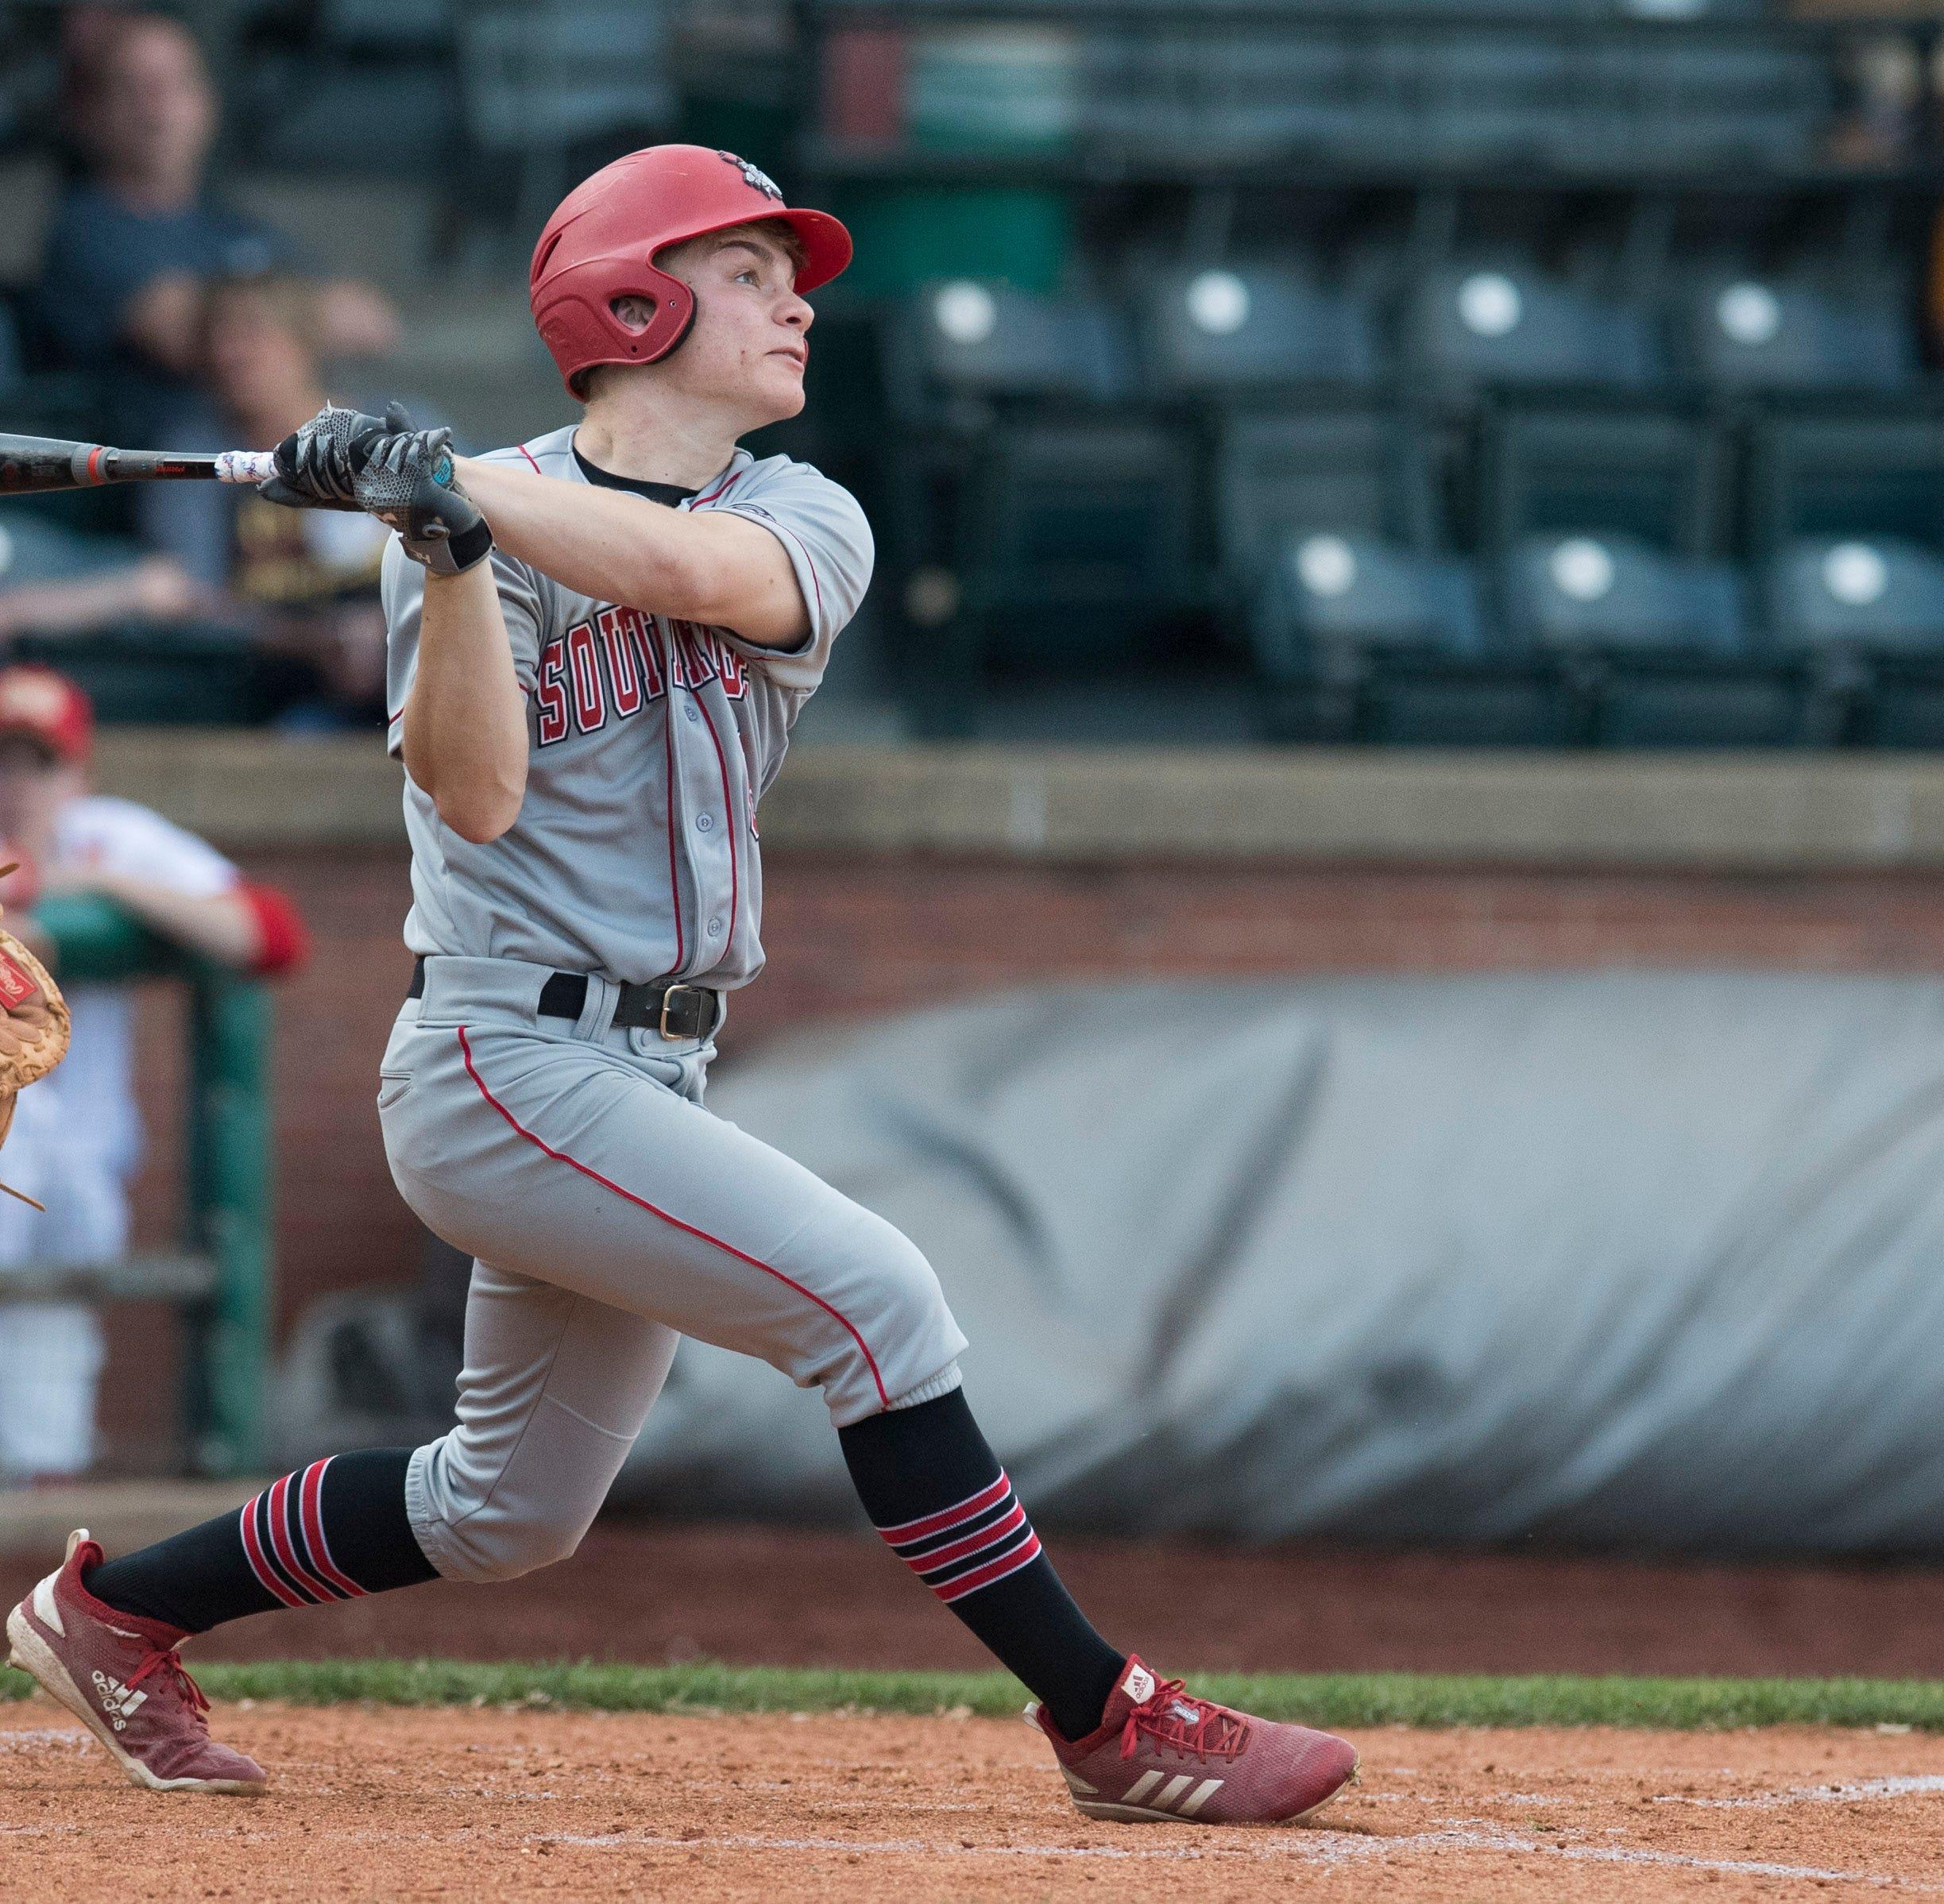 Southridge's multi-sport standout Schank to play baseball for Indiana University